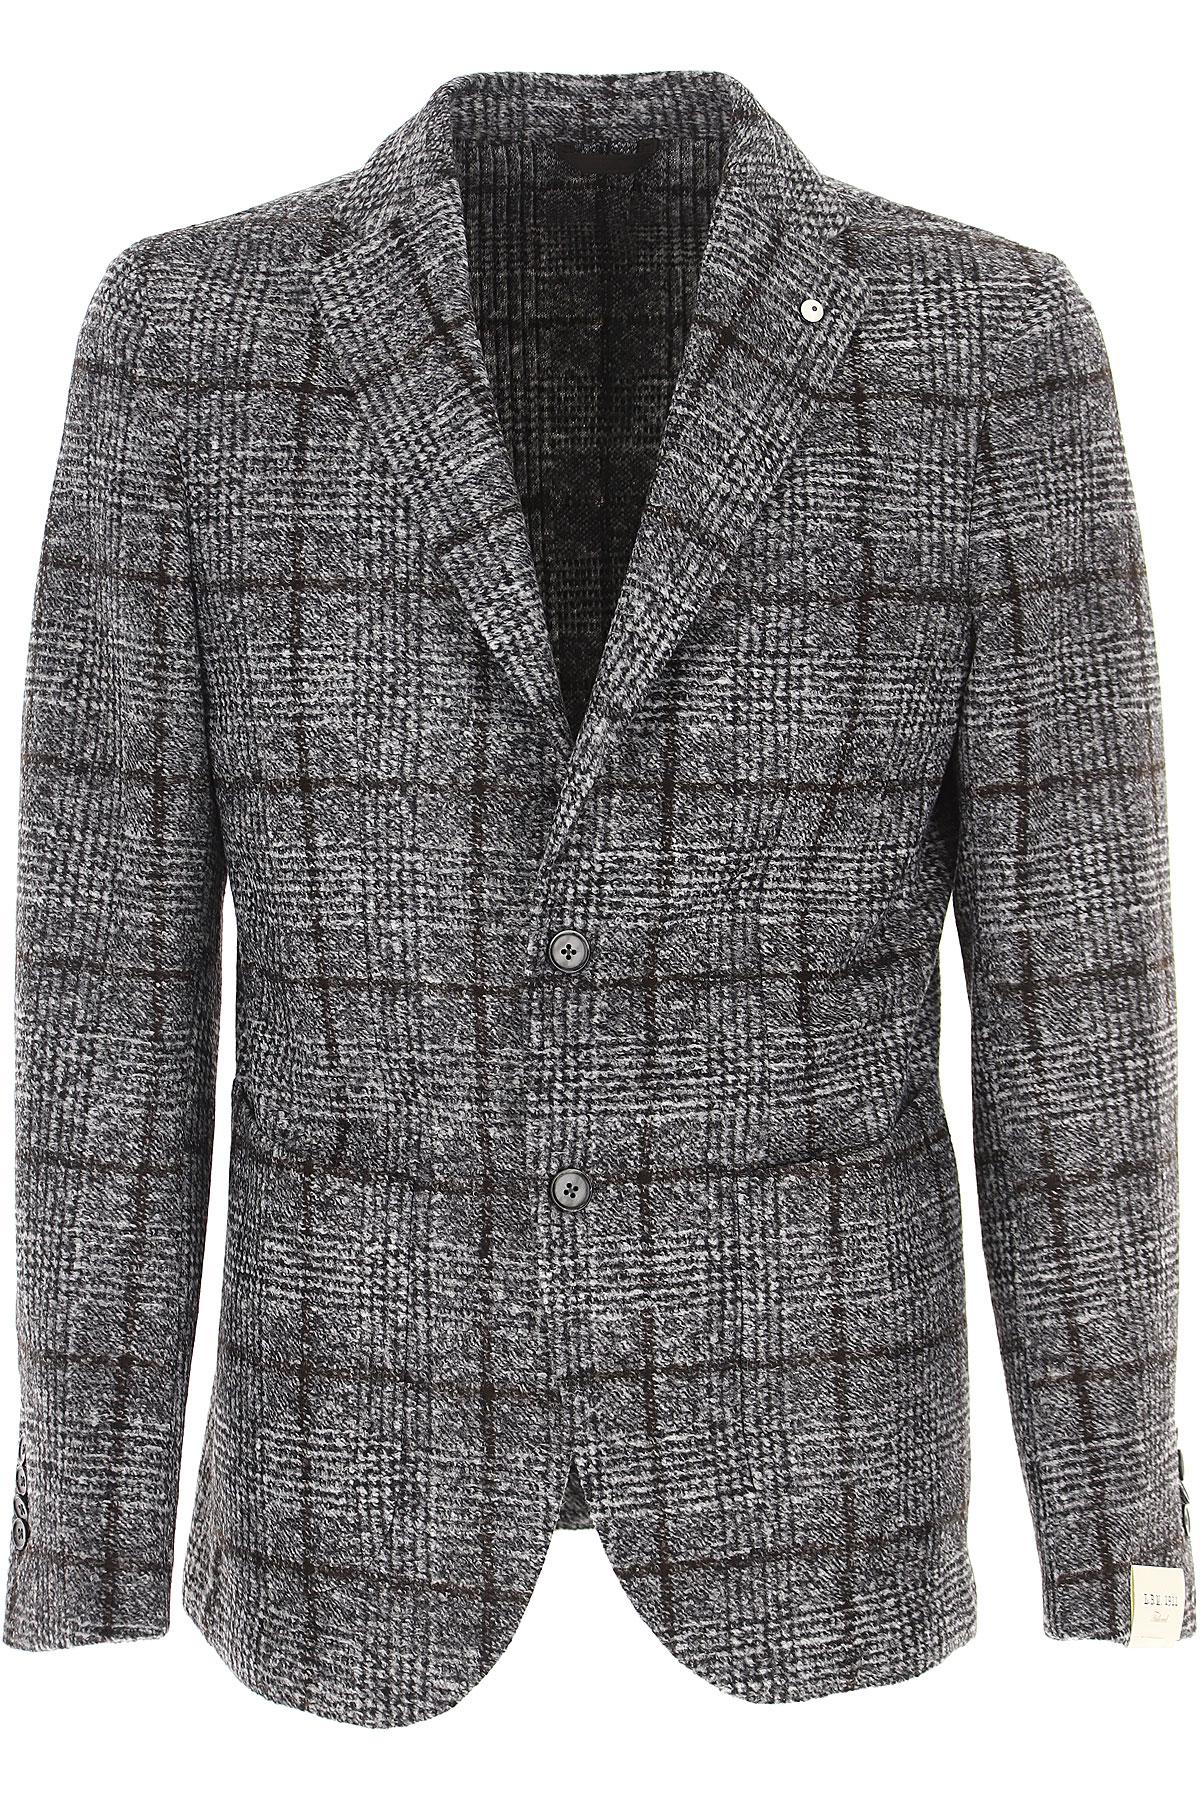 L.B.M. 1911 Blazer for Men, Sport Coat On Sale, Grey, Acrylic, 2019, L M XXL